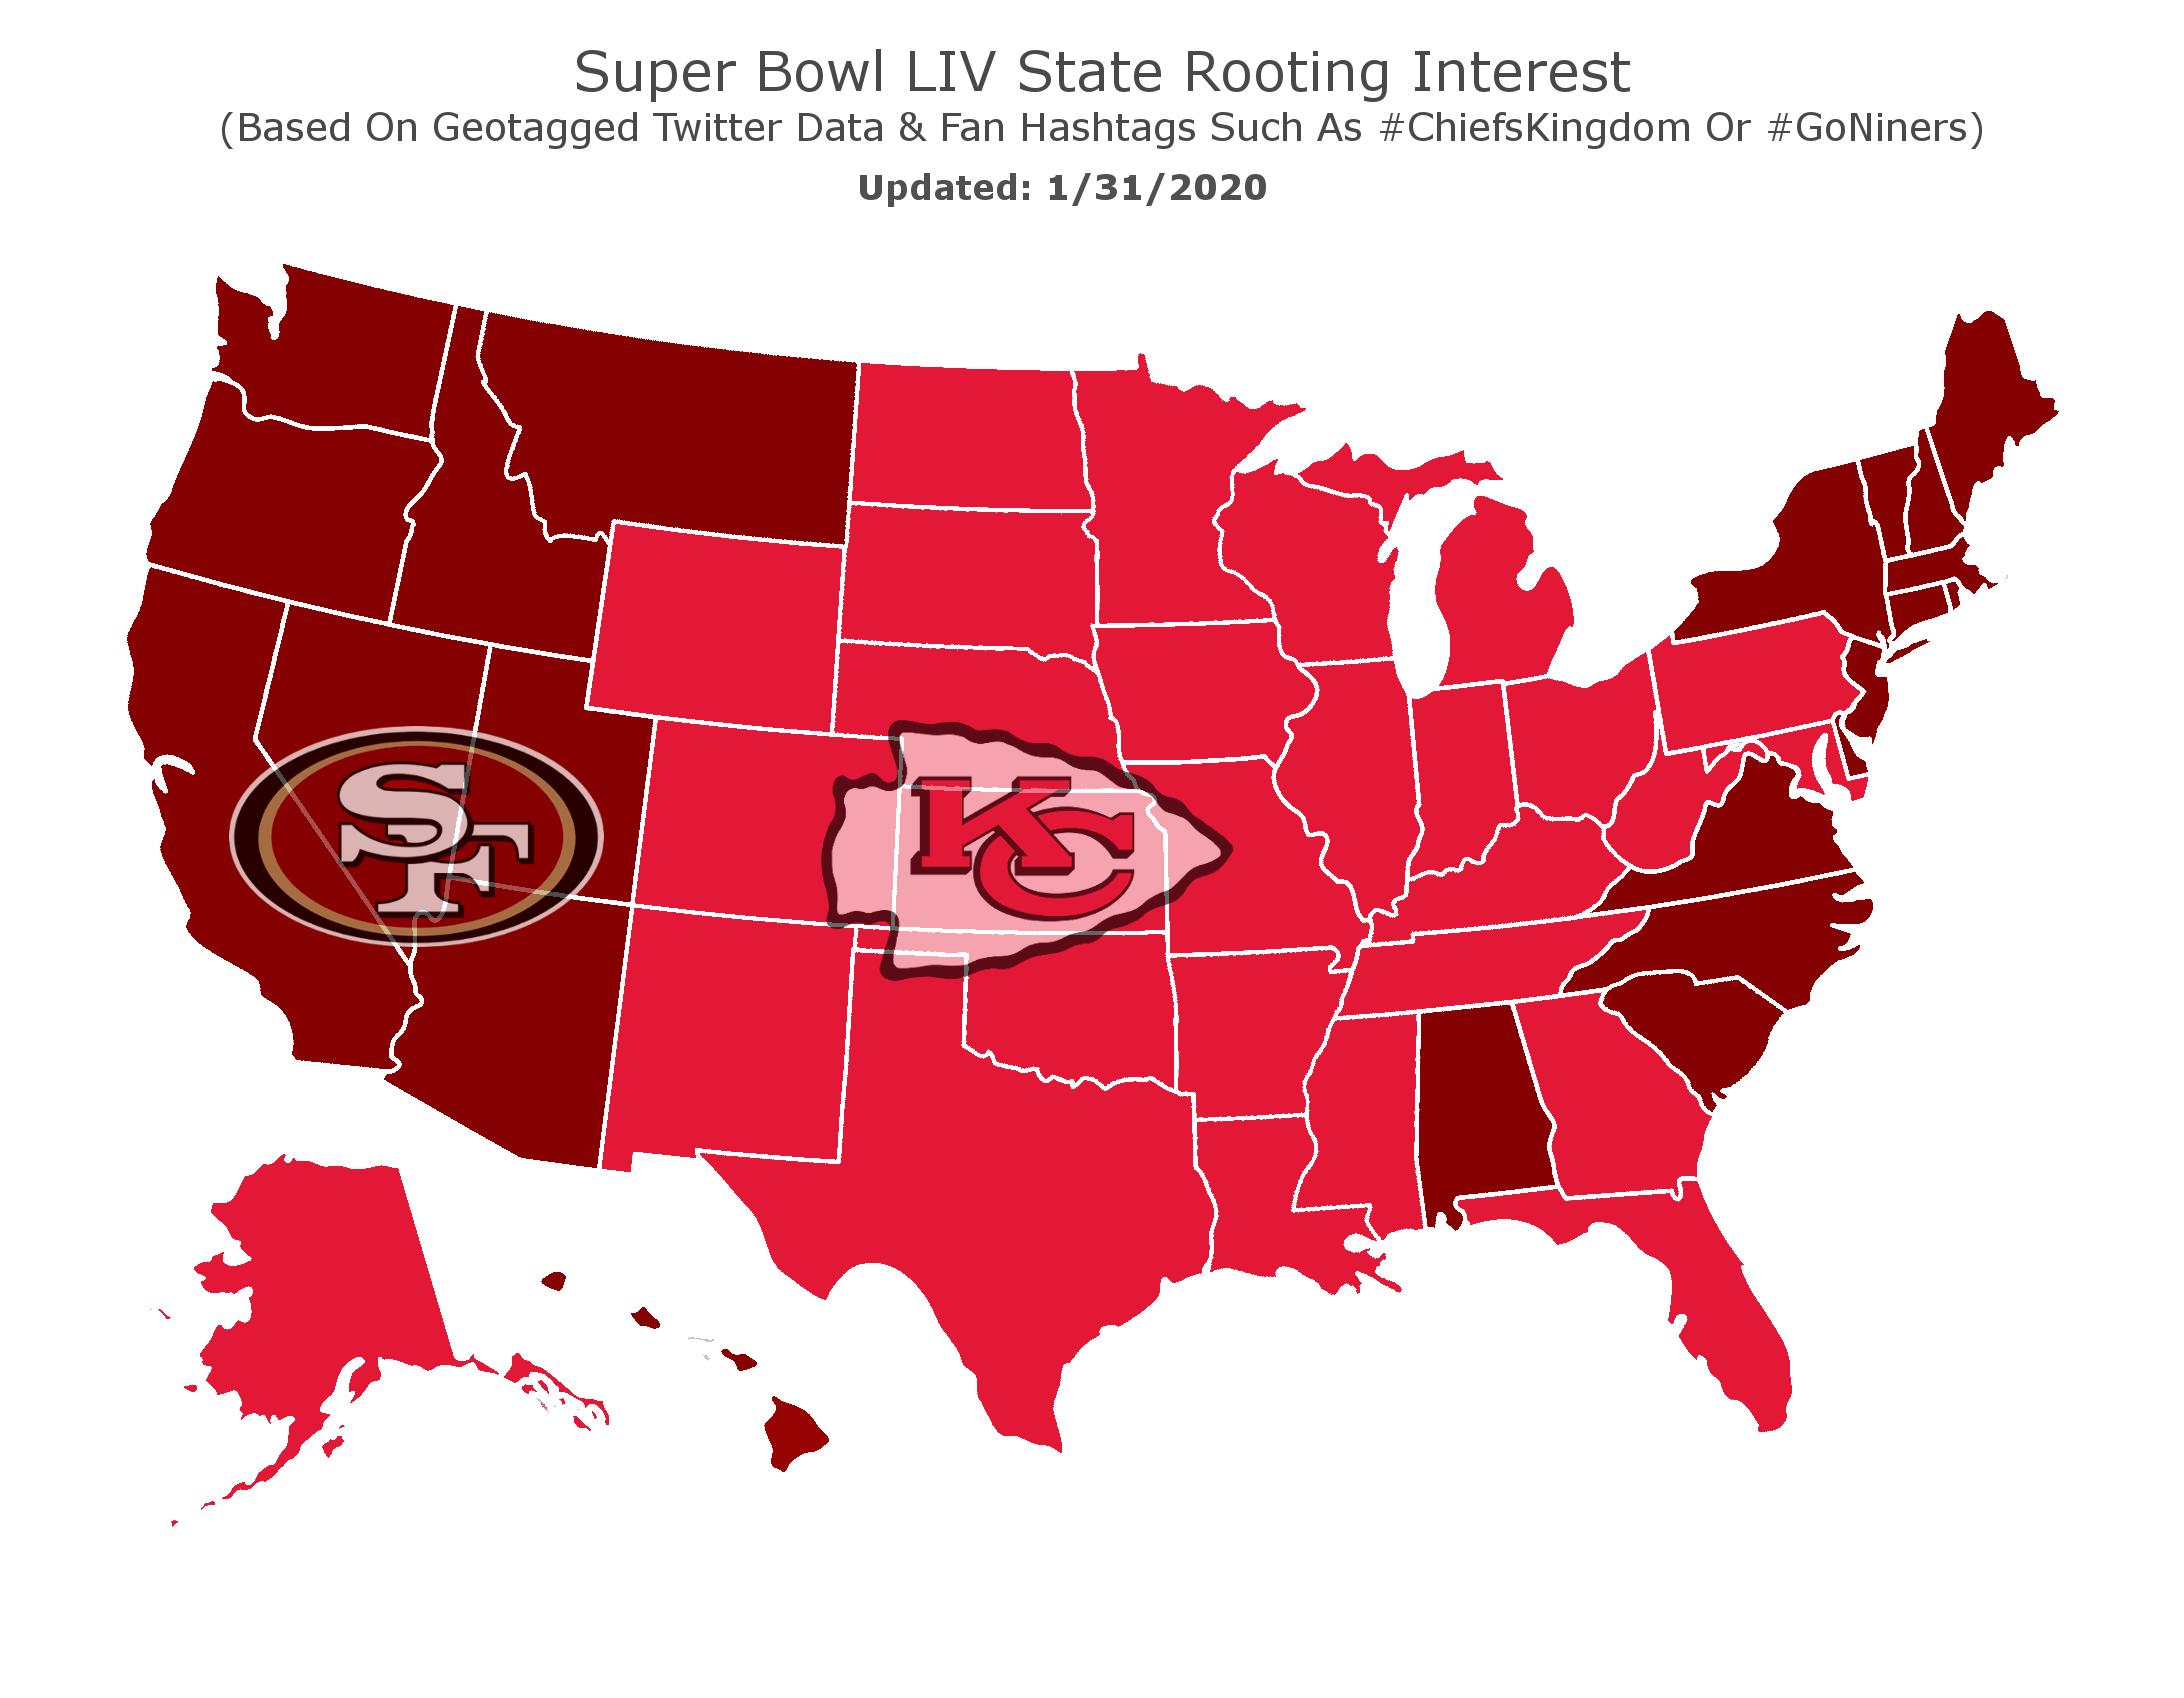 super bowl LIV map updated